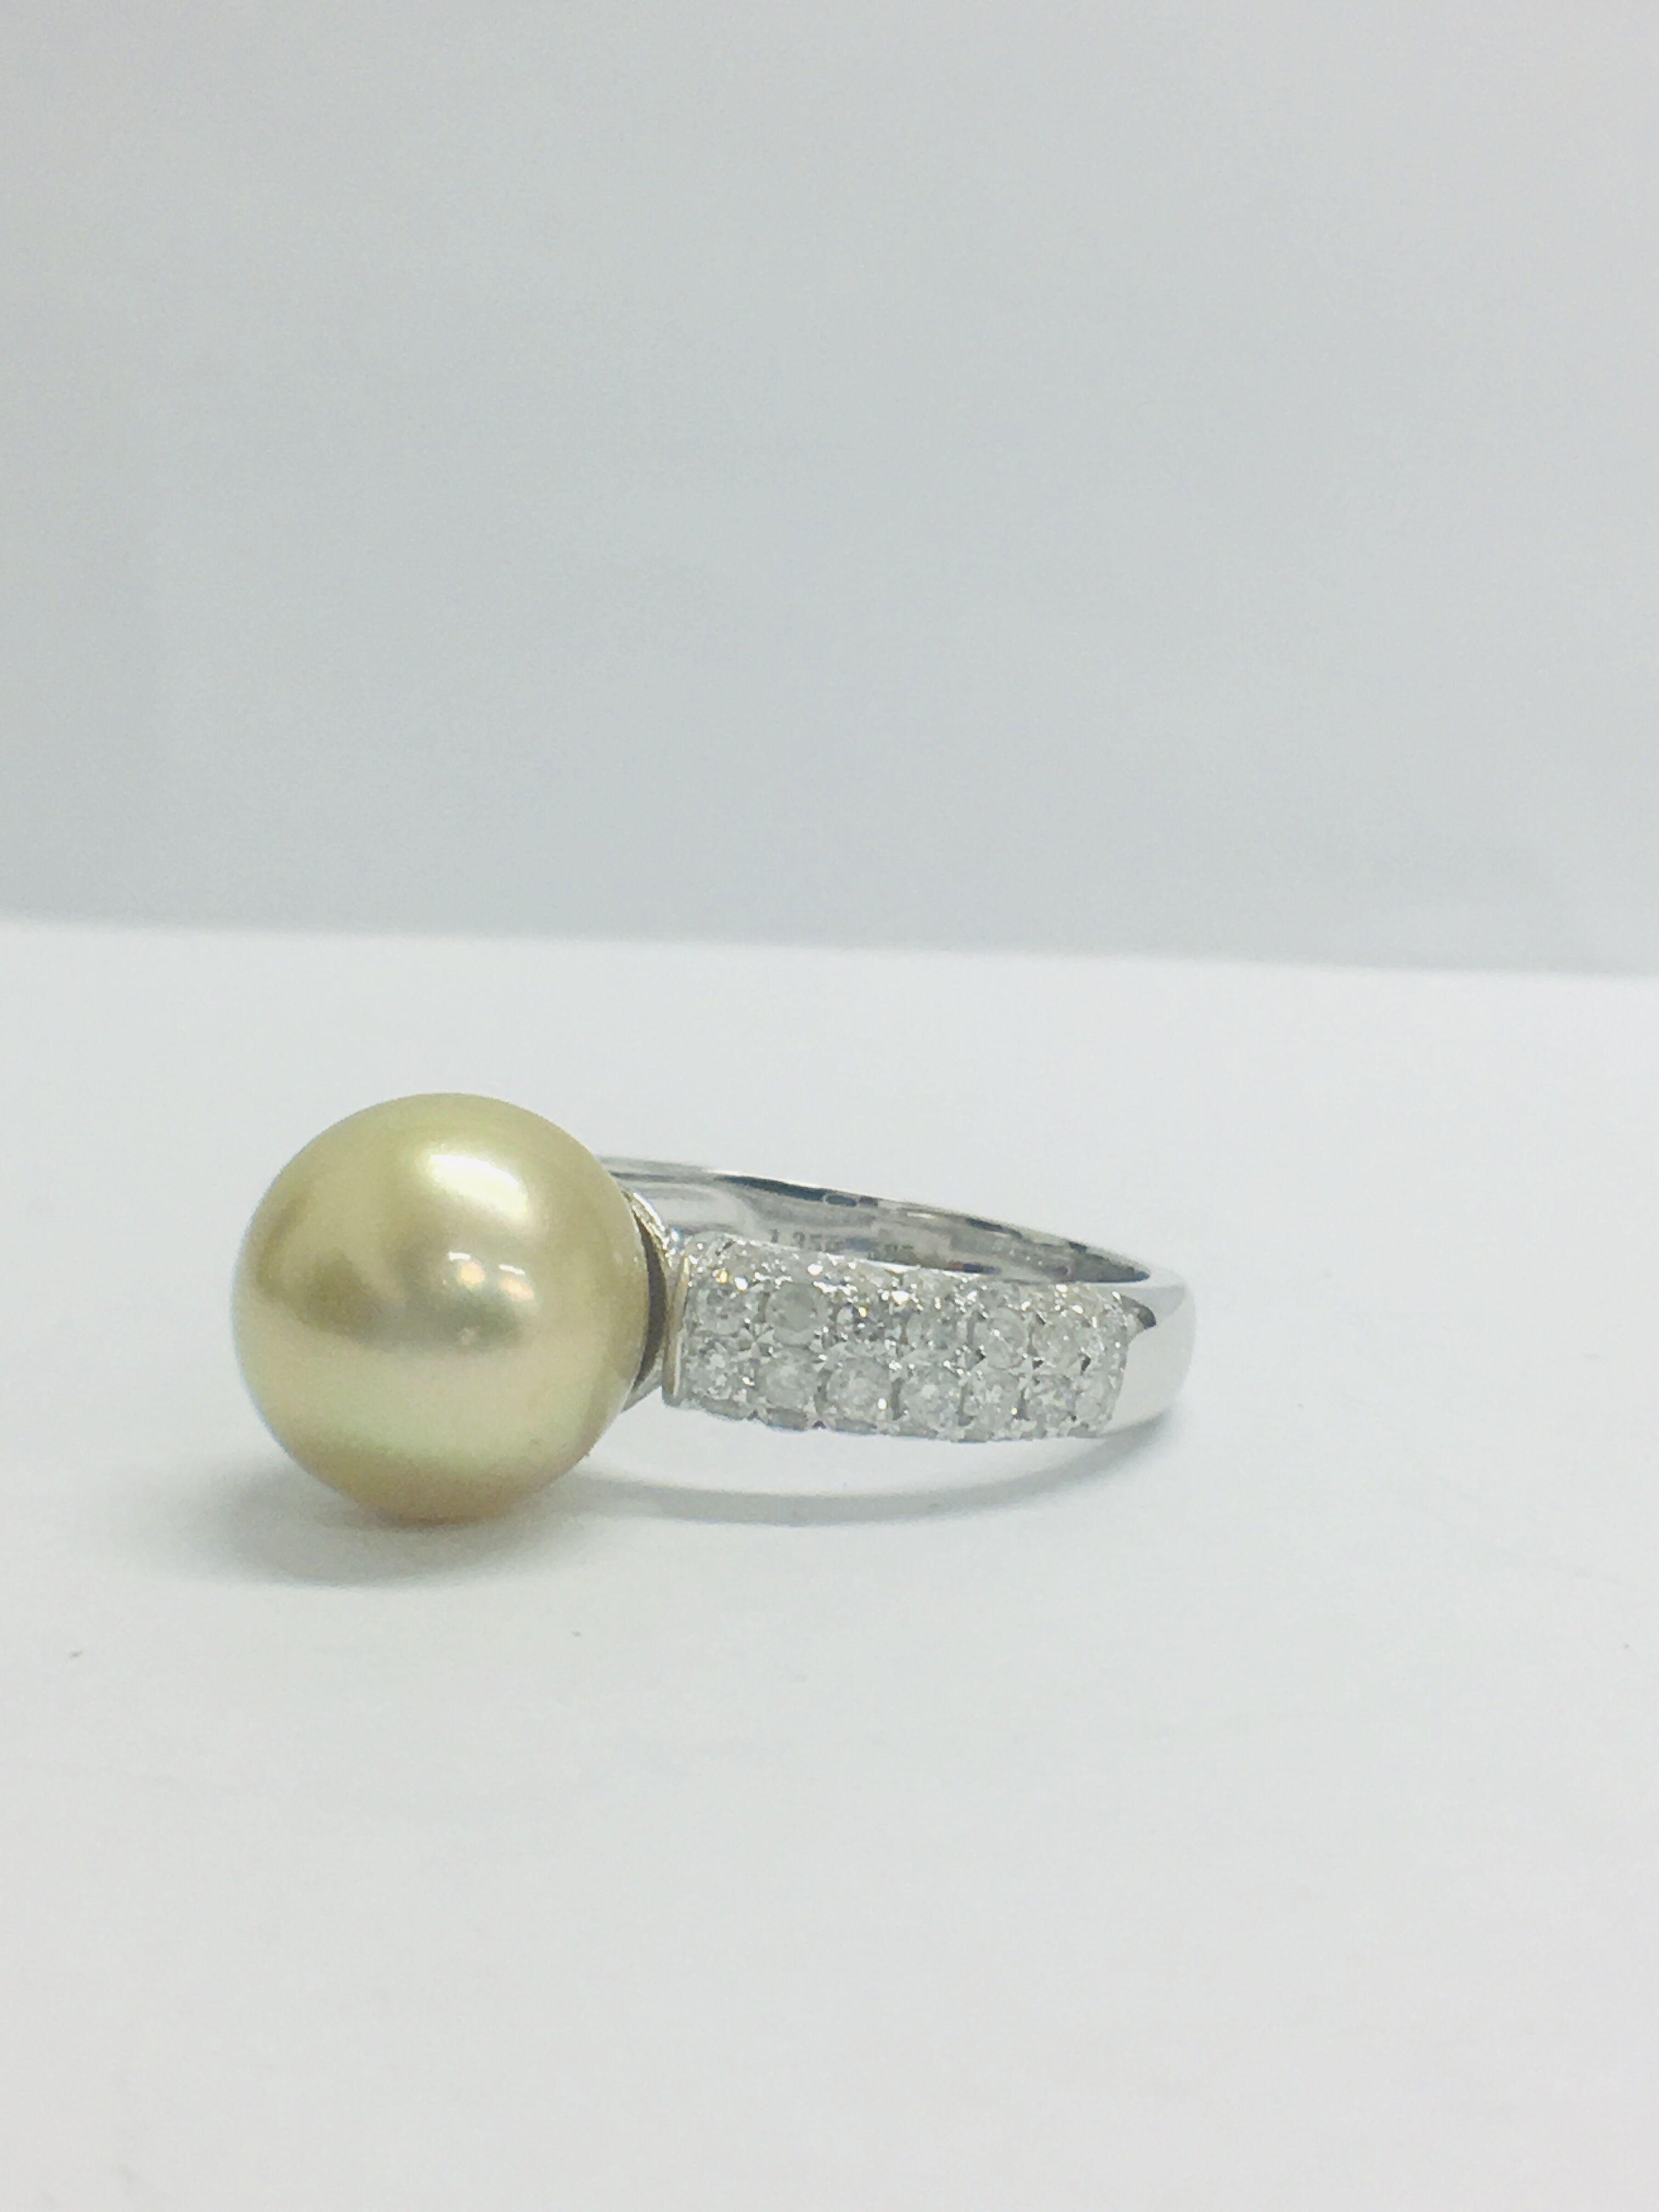 Lot 21 - 14ct white gold pearl & diamond ring.